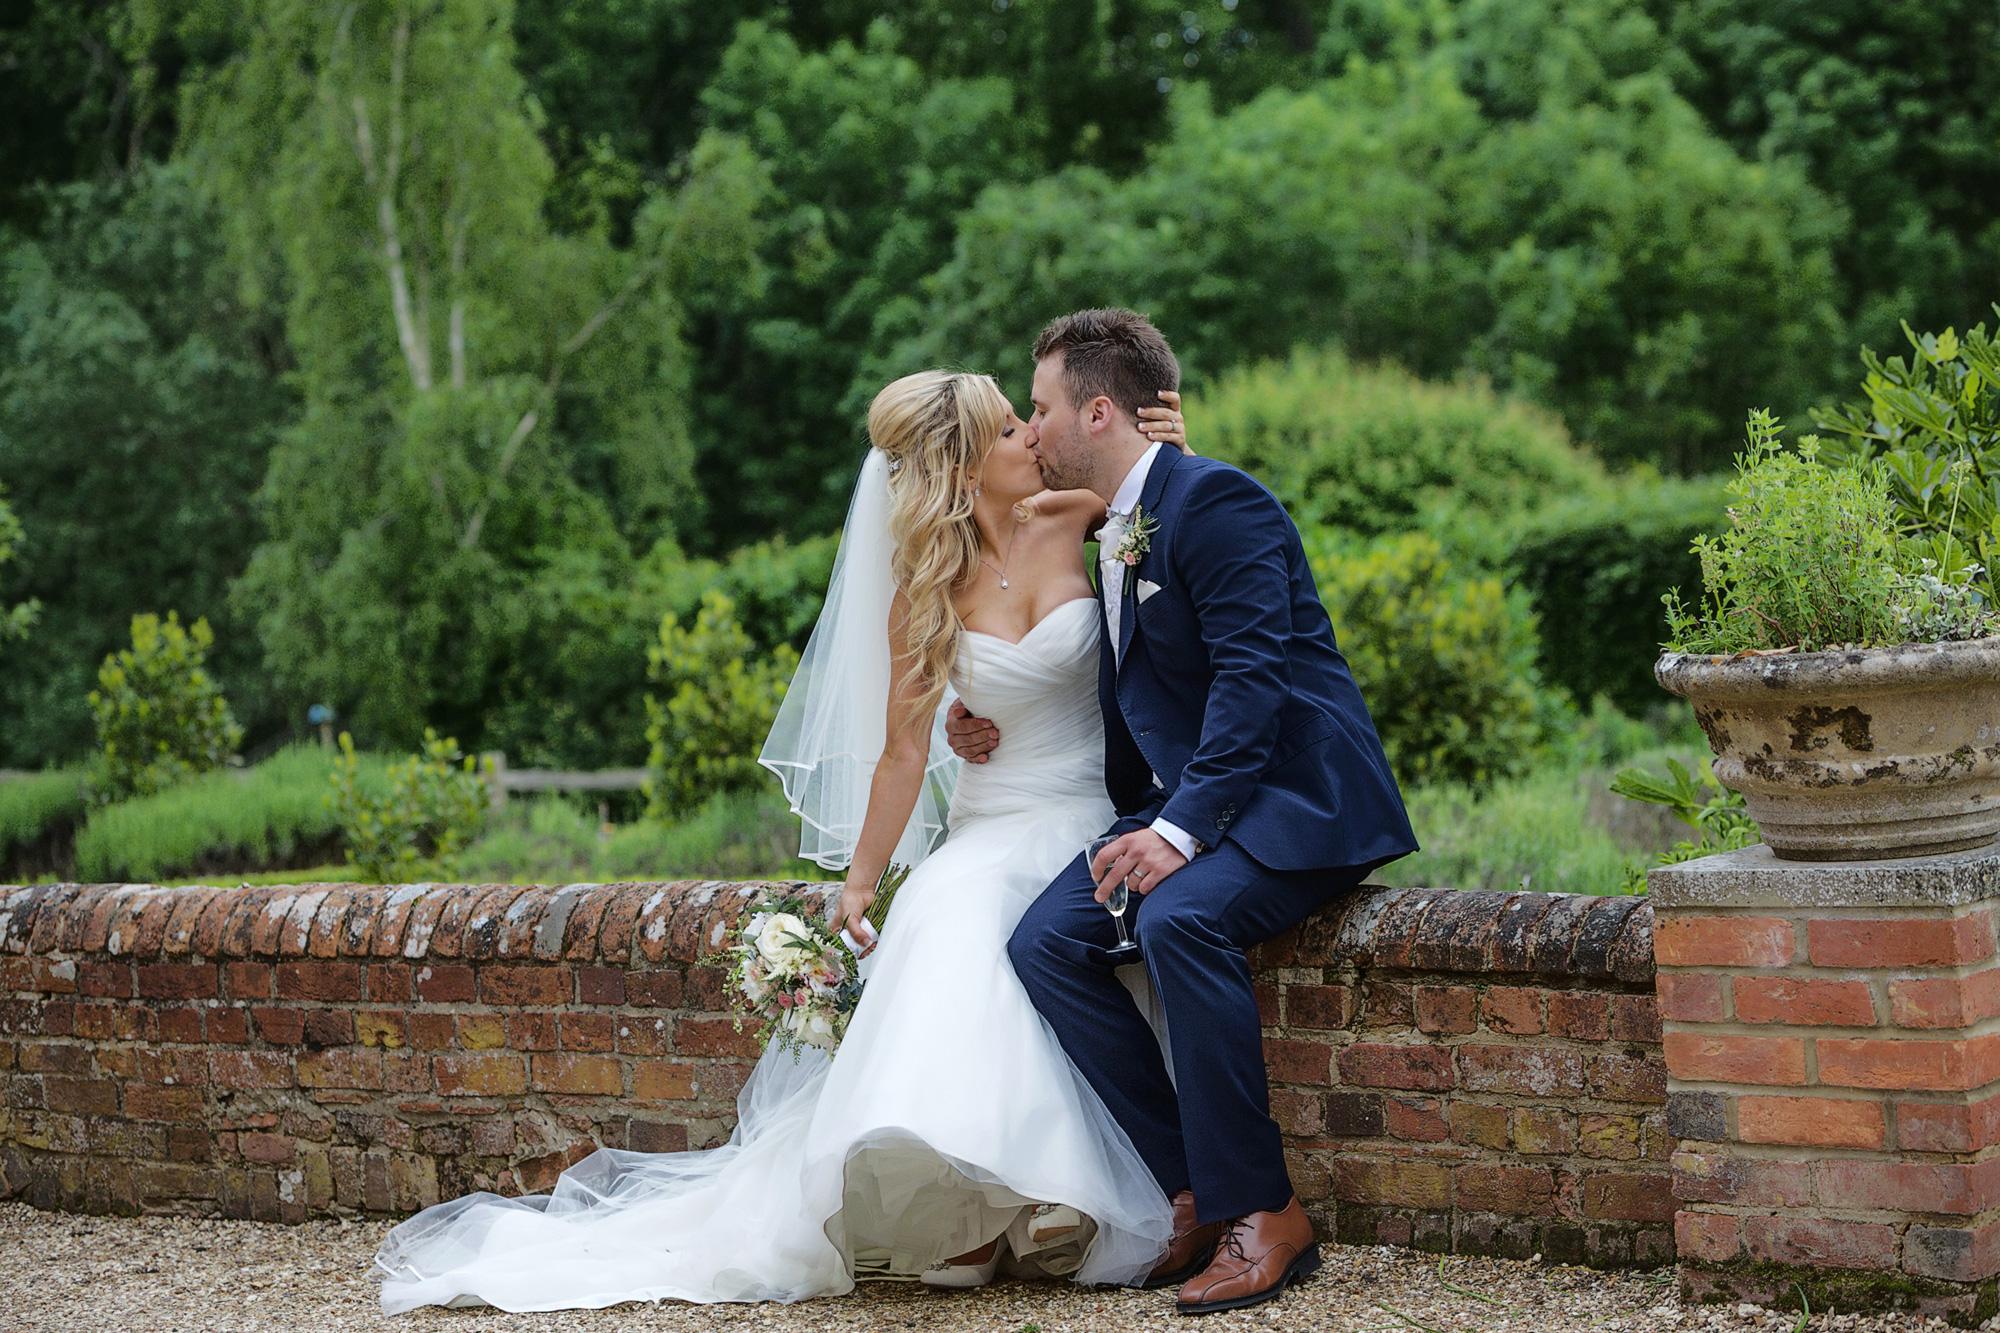 Adam_Hillier_Wedding_Photographer_Newbury_Berkshire_5 (9).jpg